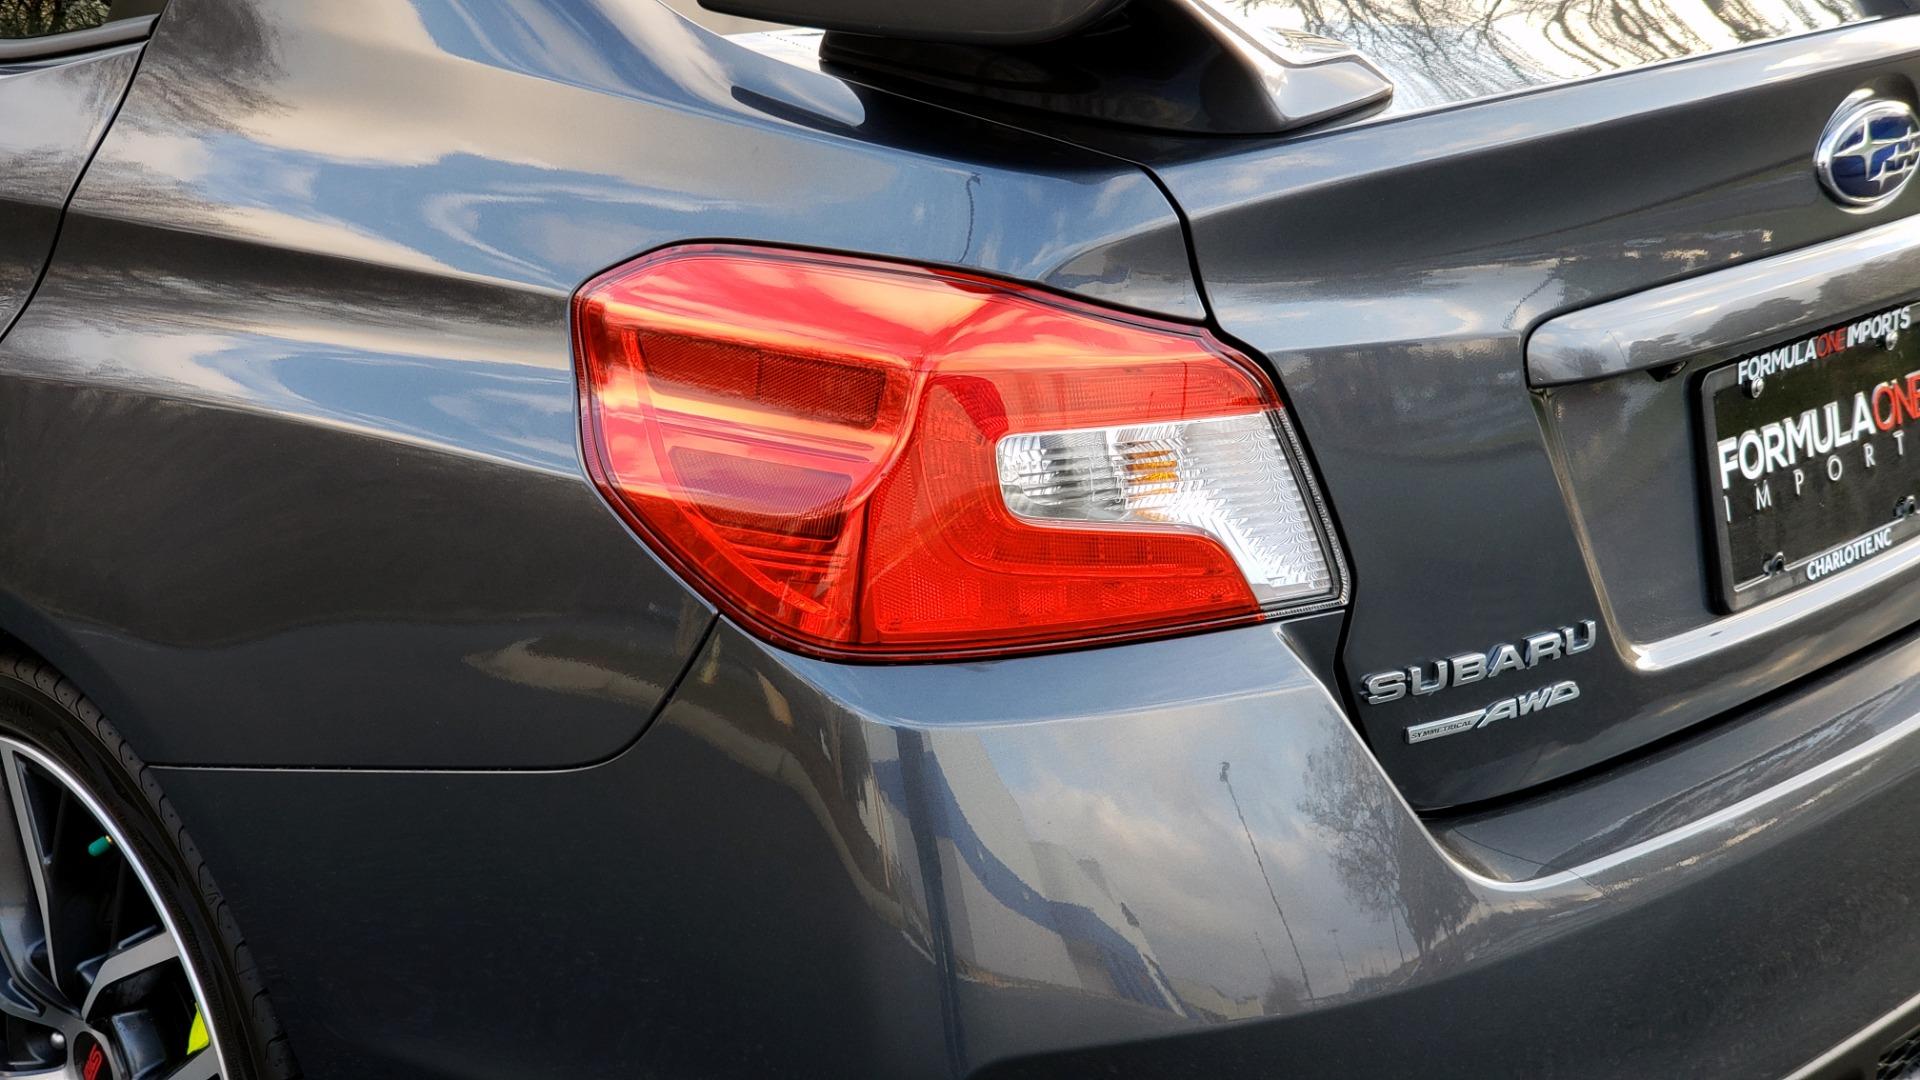 Used 2020 Subaru WRX STI 2.5L TURBO / 6-SPEED MANUAL / RECARO SEATS / REARVIEW for sale Sold at Formula Imports in Charlotte NC 28227 45